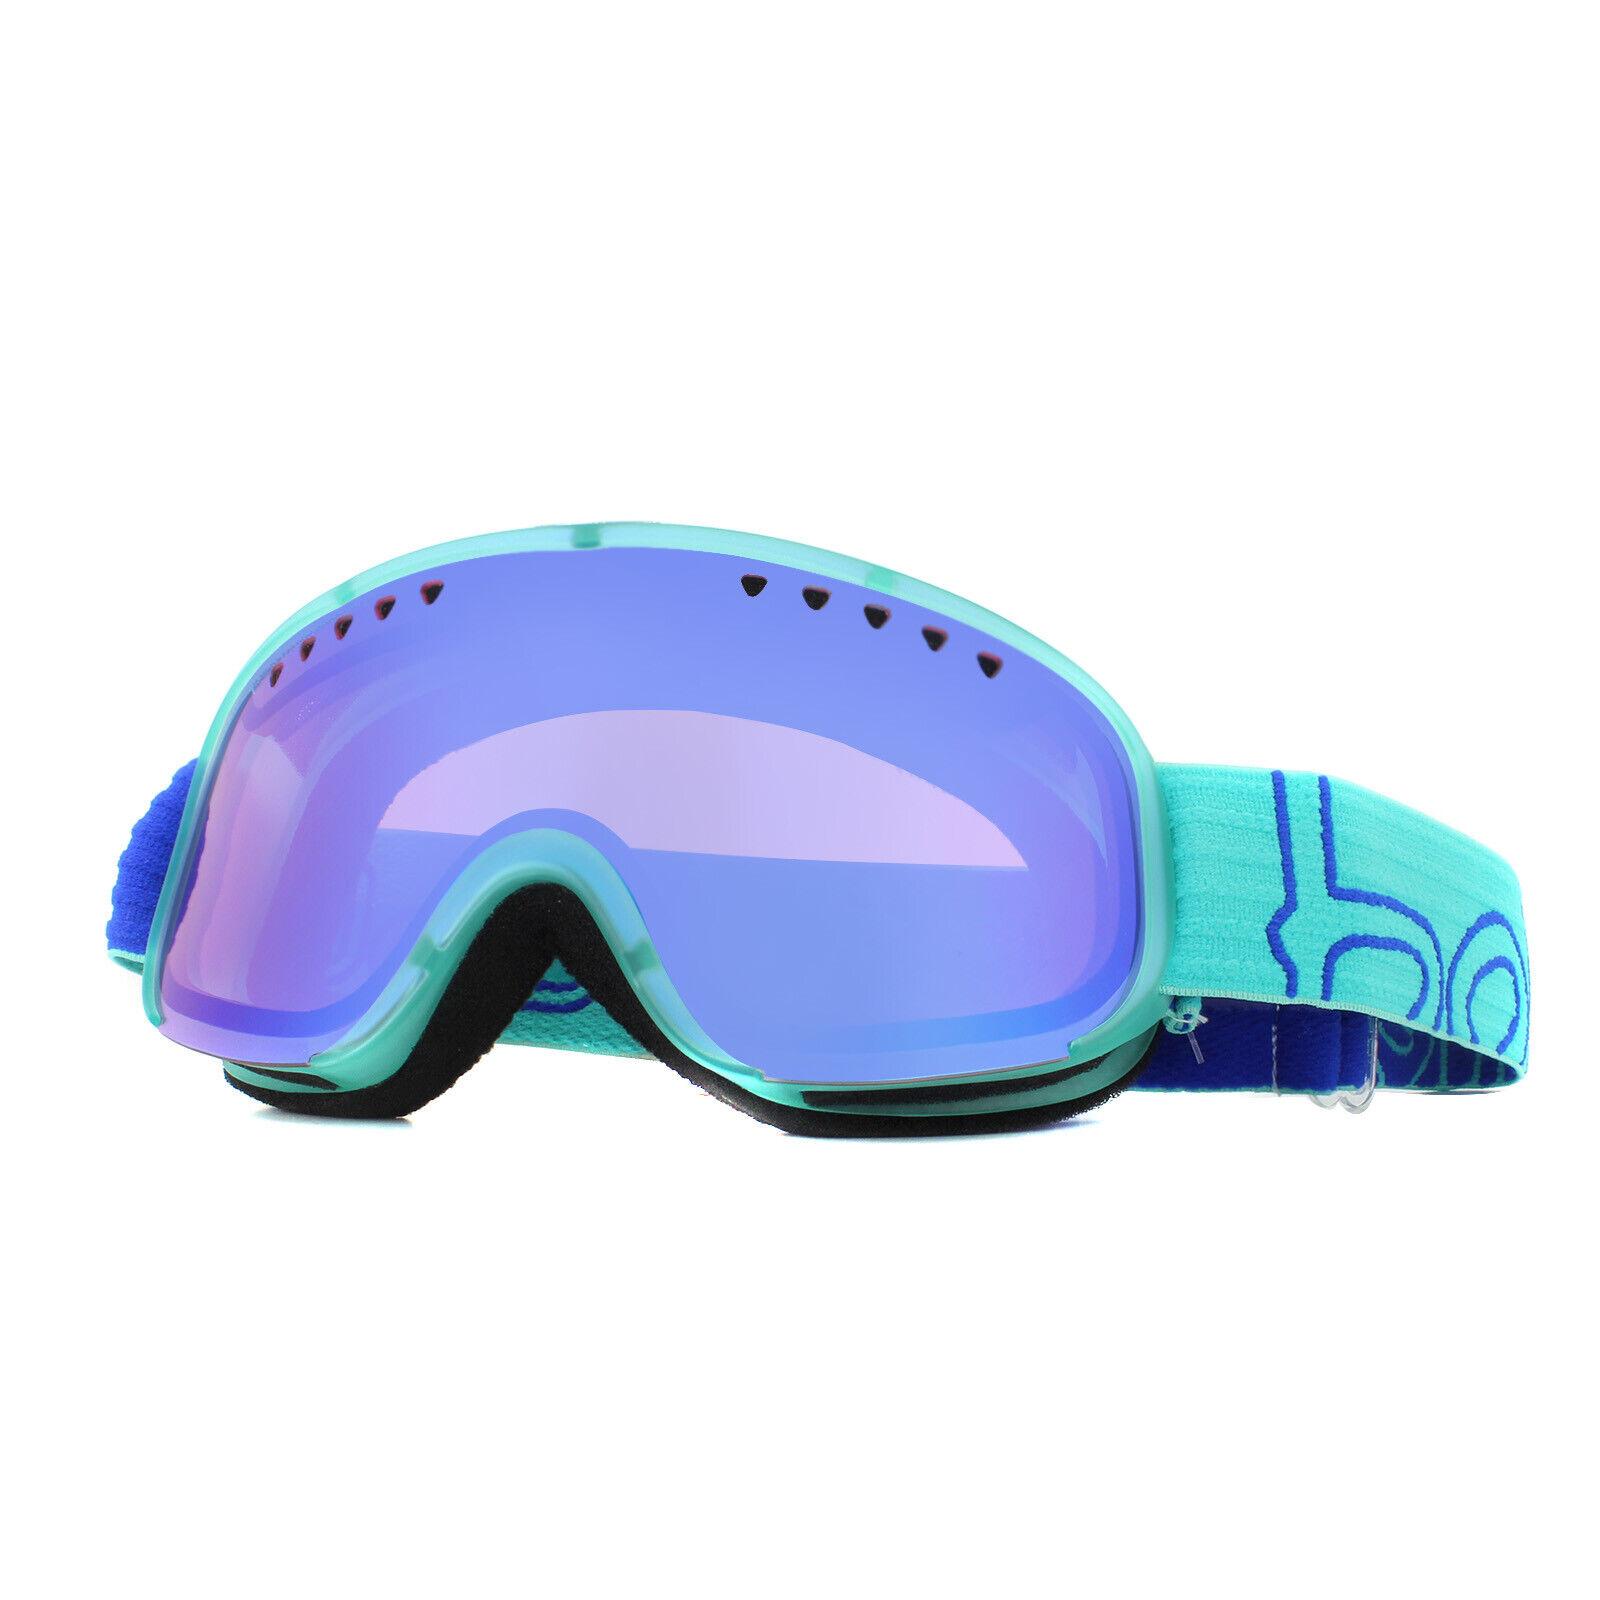 Bolle Skibrille Scarlett 21474 Matt Türkis Blau Modulator Vermillon Blau